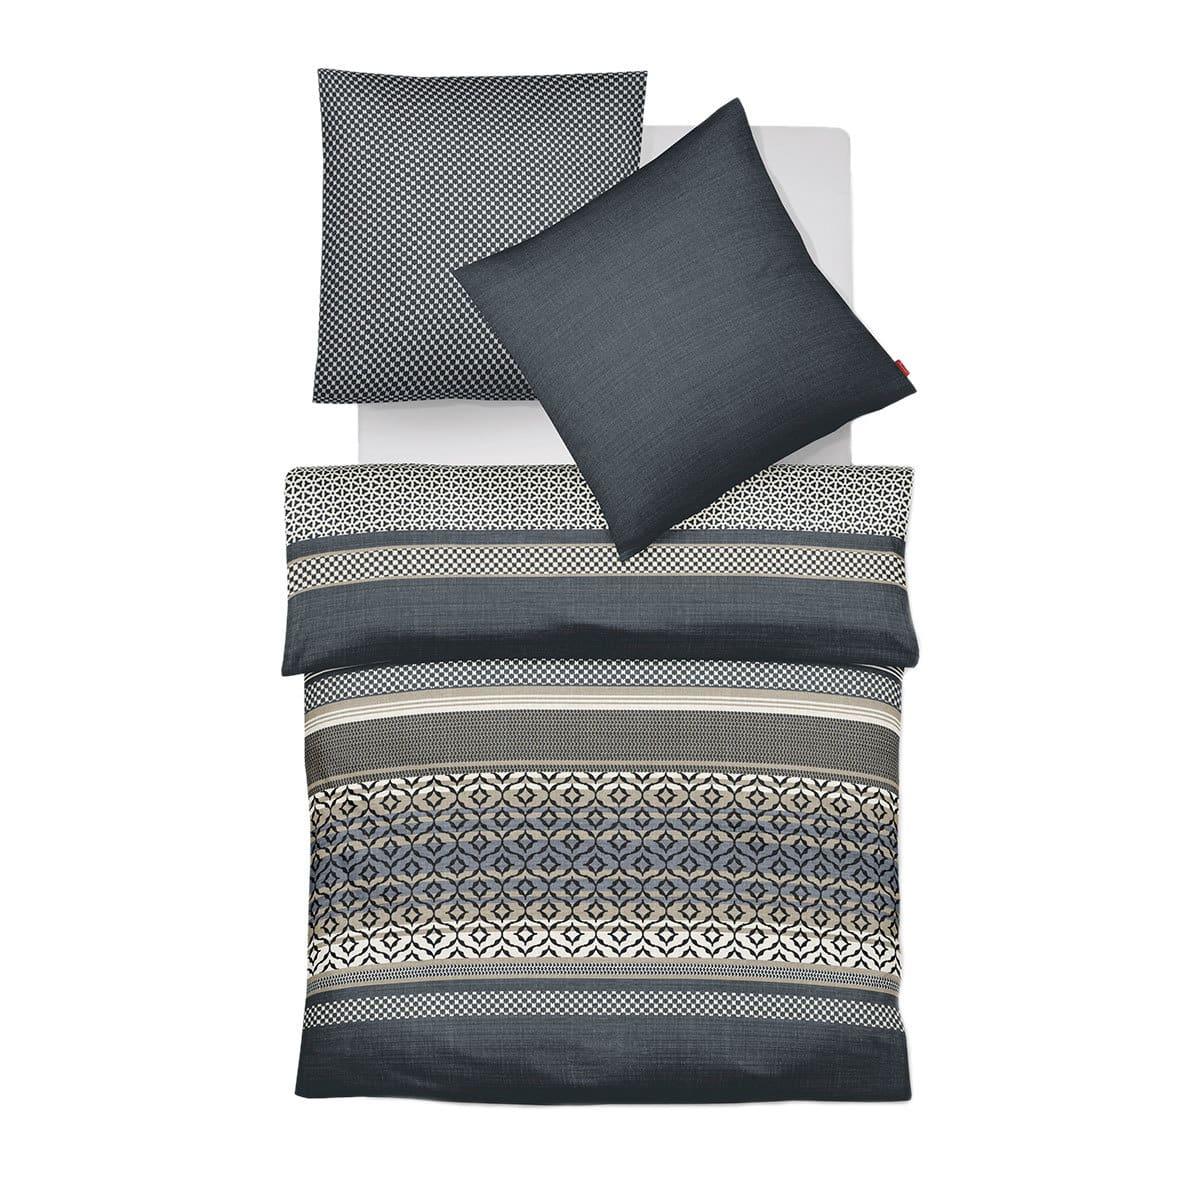 fleuresse mako satin bettw sche modern life 113776 0001. Black Bedroom Furniture Sets. Home Design Ideas